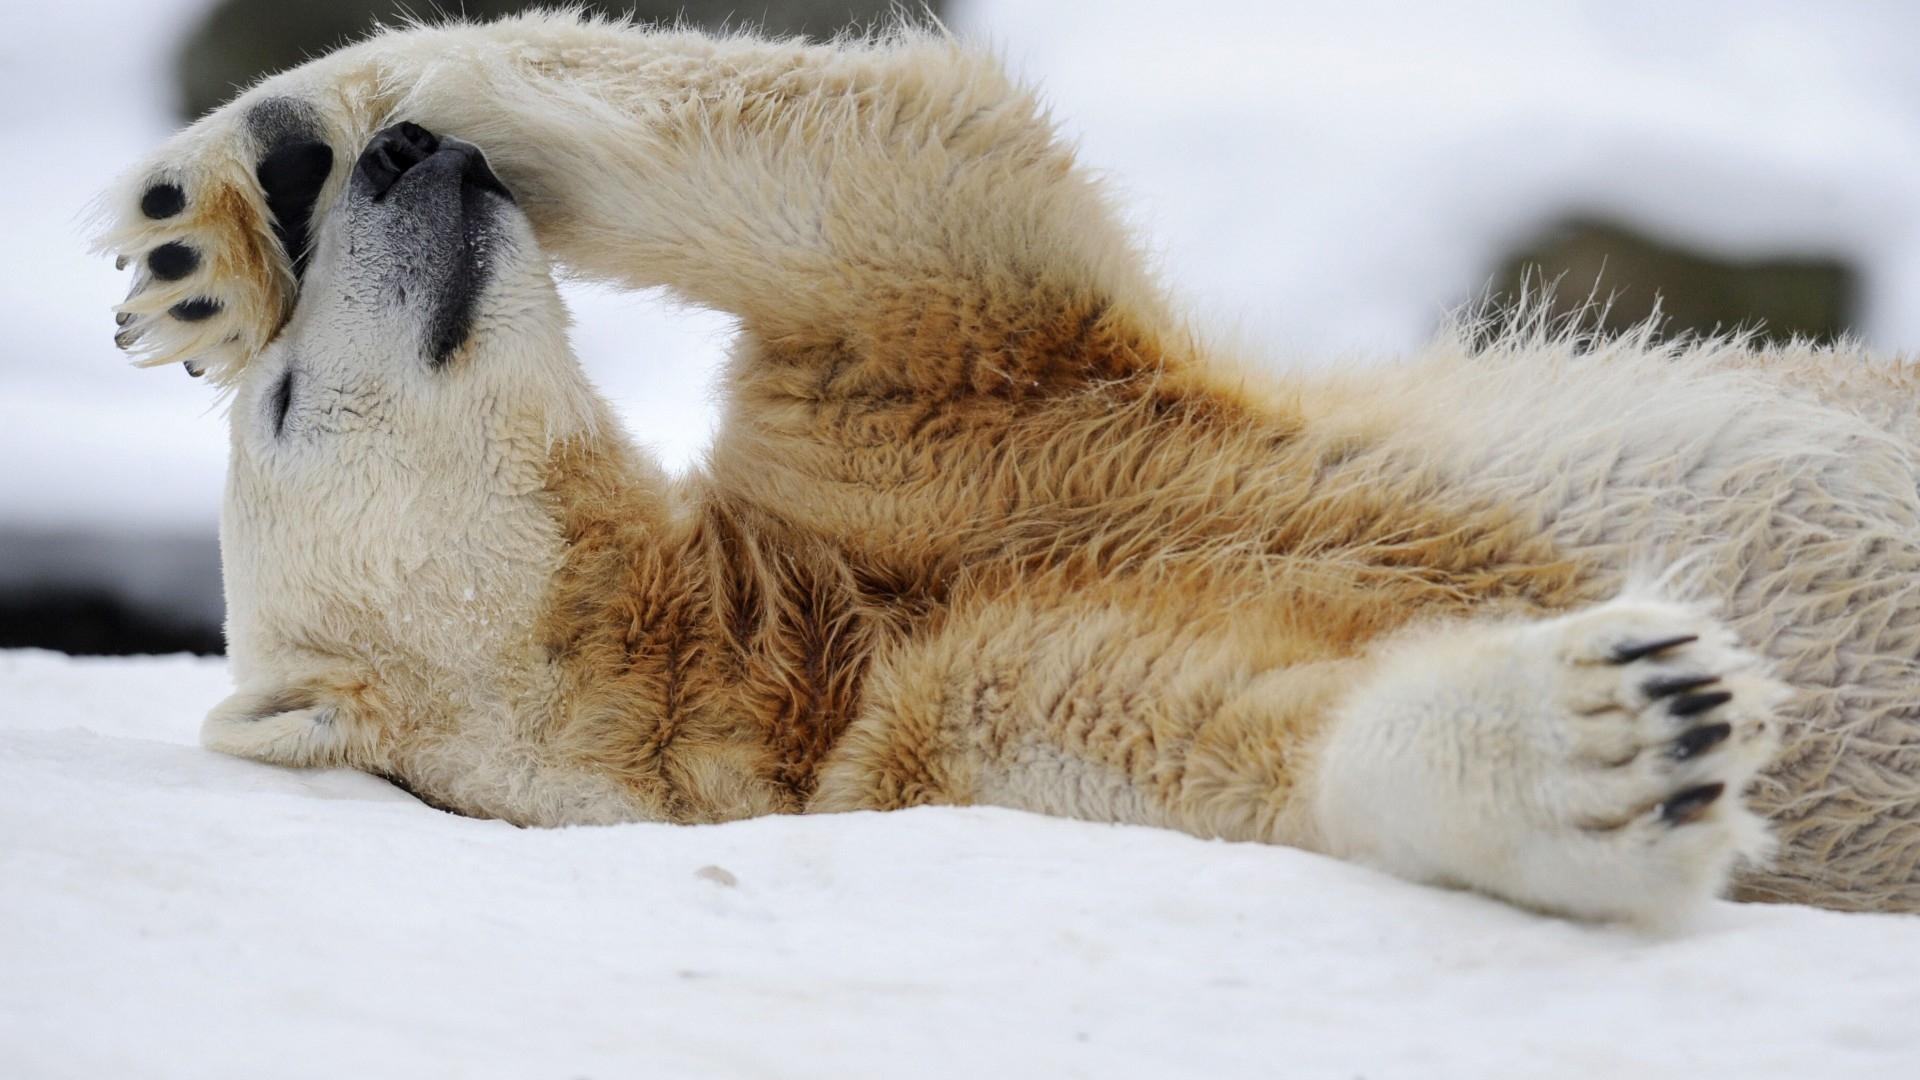 Download Wallpaper 1920x1080 Polar Bear, Snow, Lying, Rest